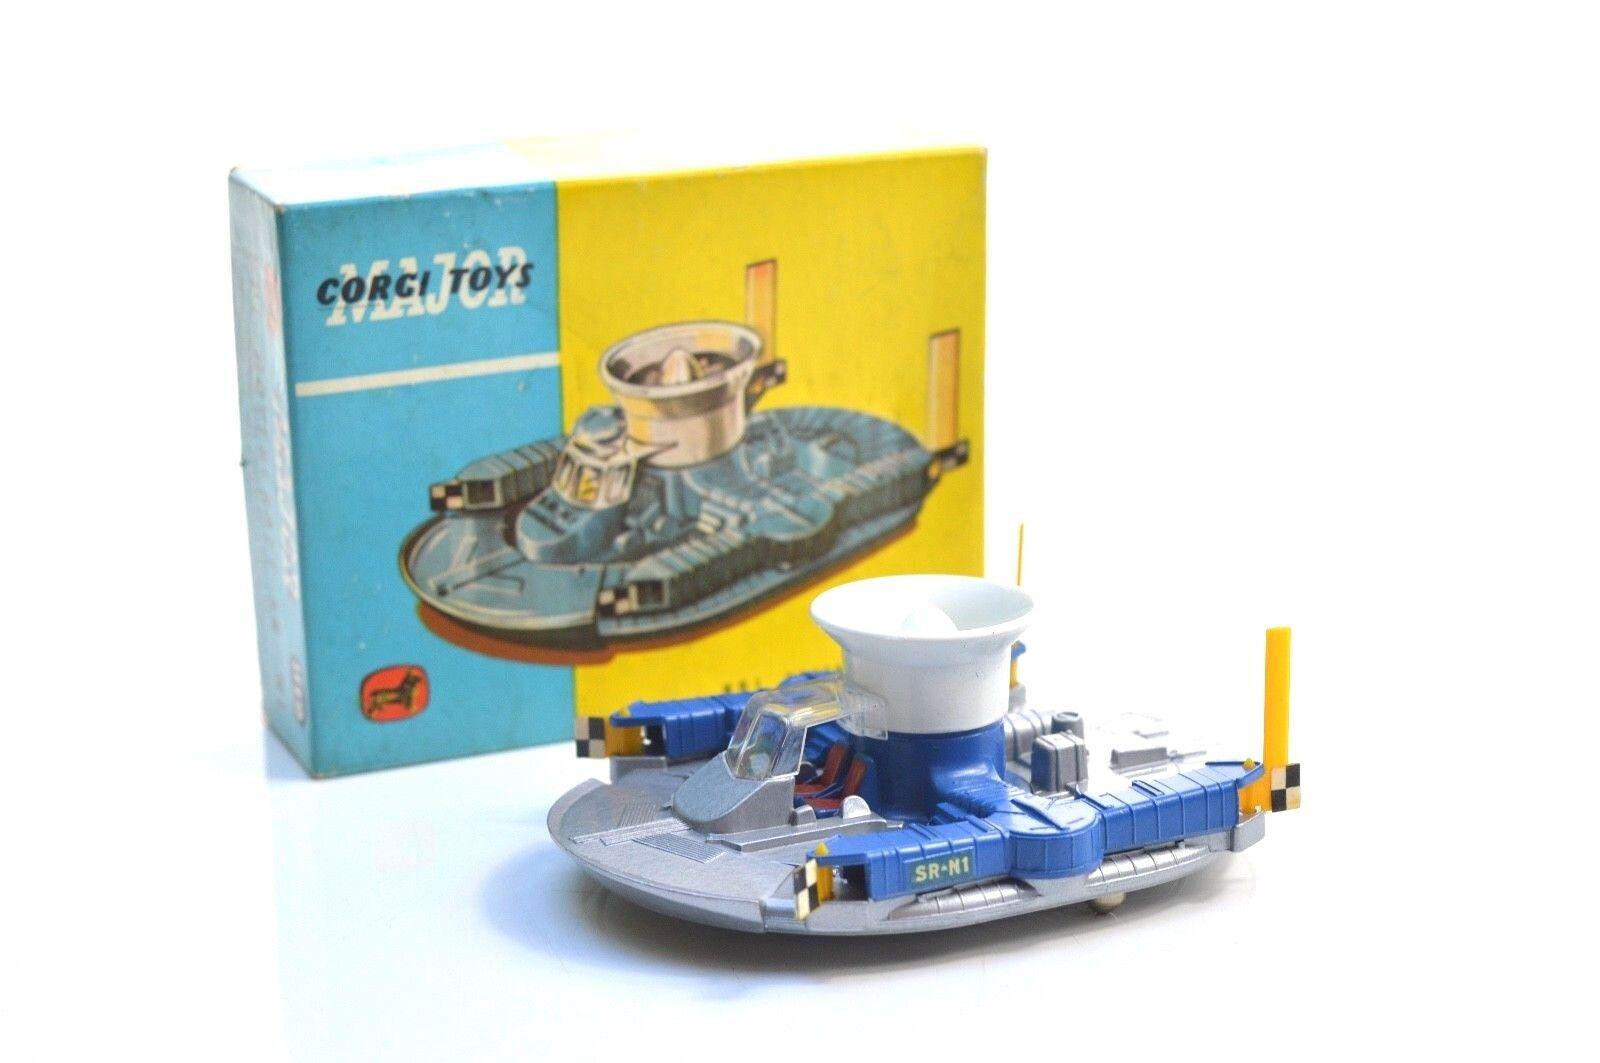 CORGI 1119 HDL Hovercraft sr-n1